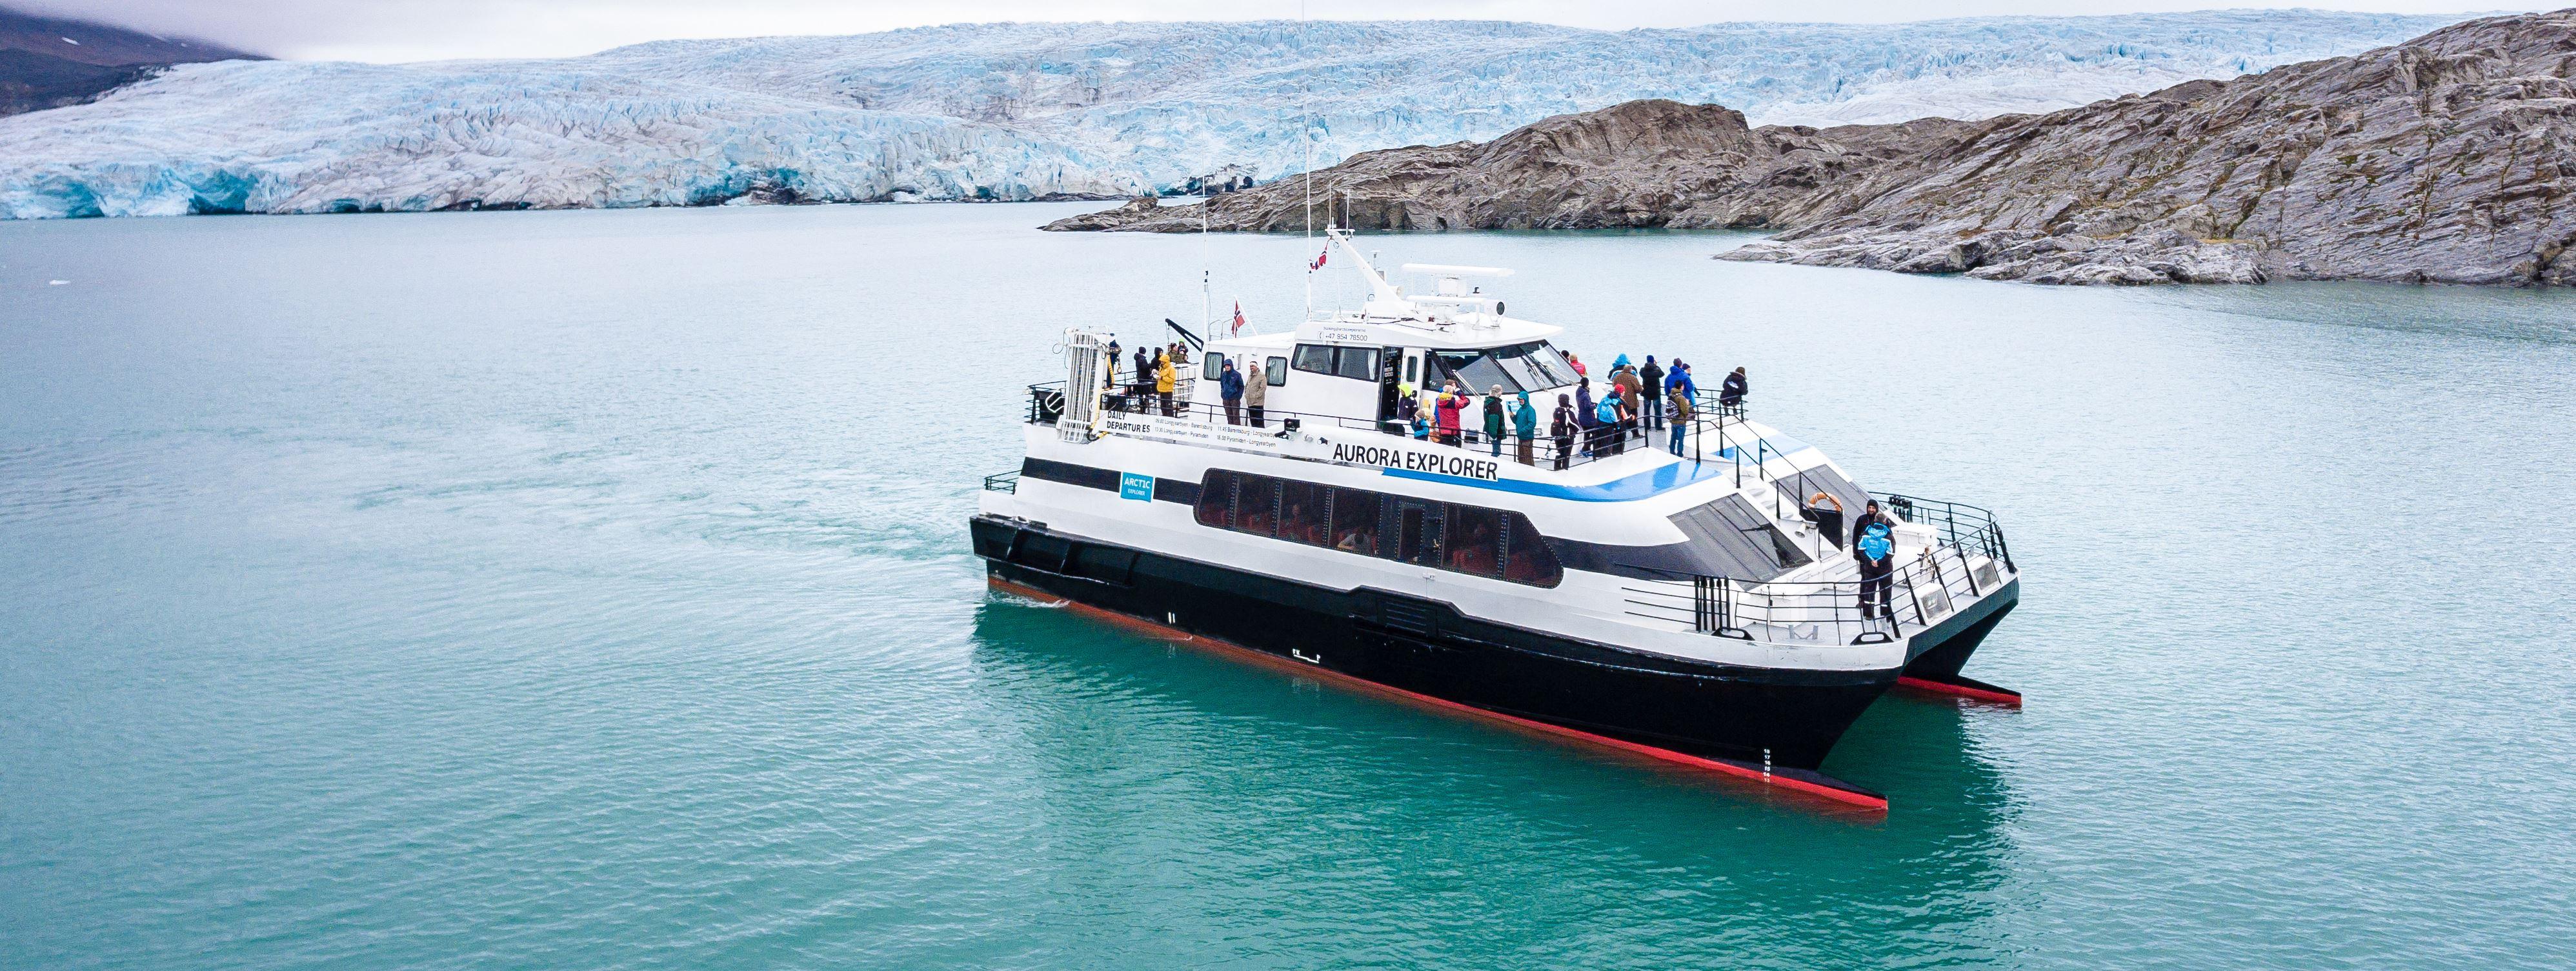 Fjord Cruise to Barentsburg